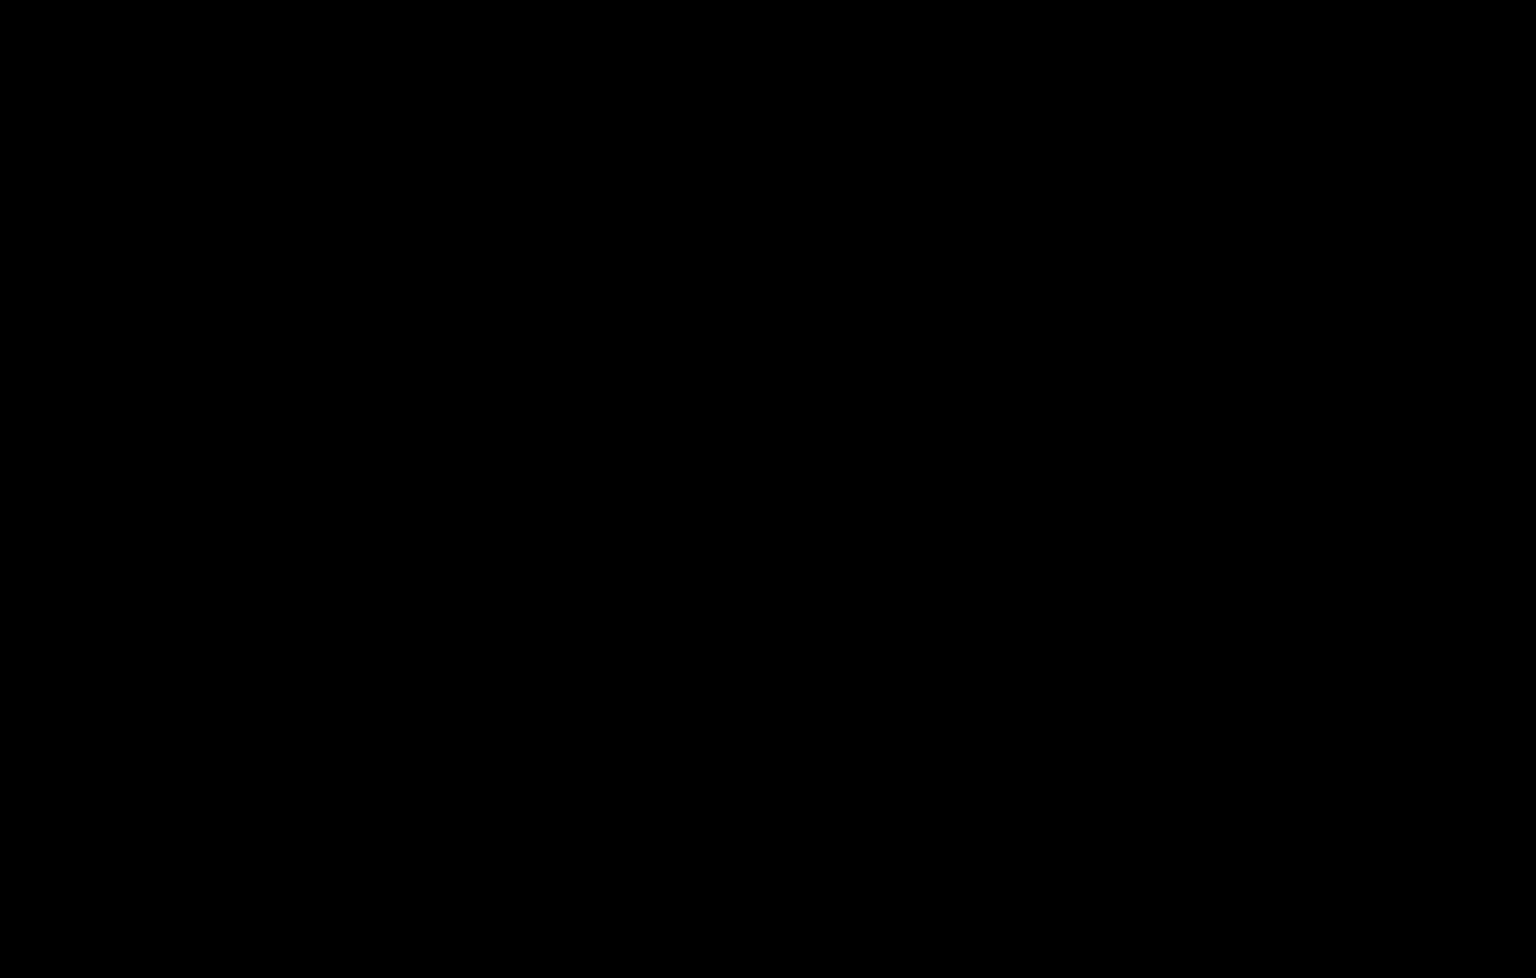 1-Methyl-4-phenyl-4-piperidinamine